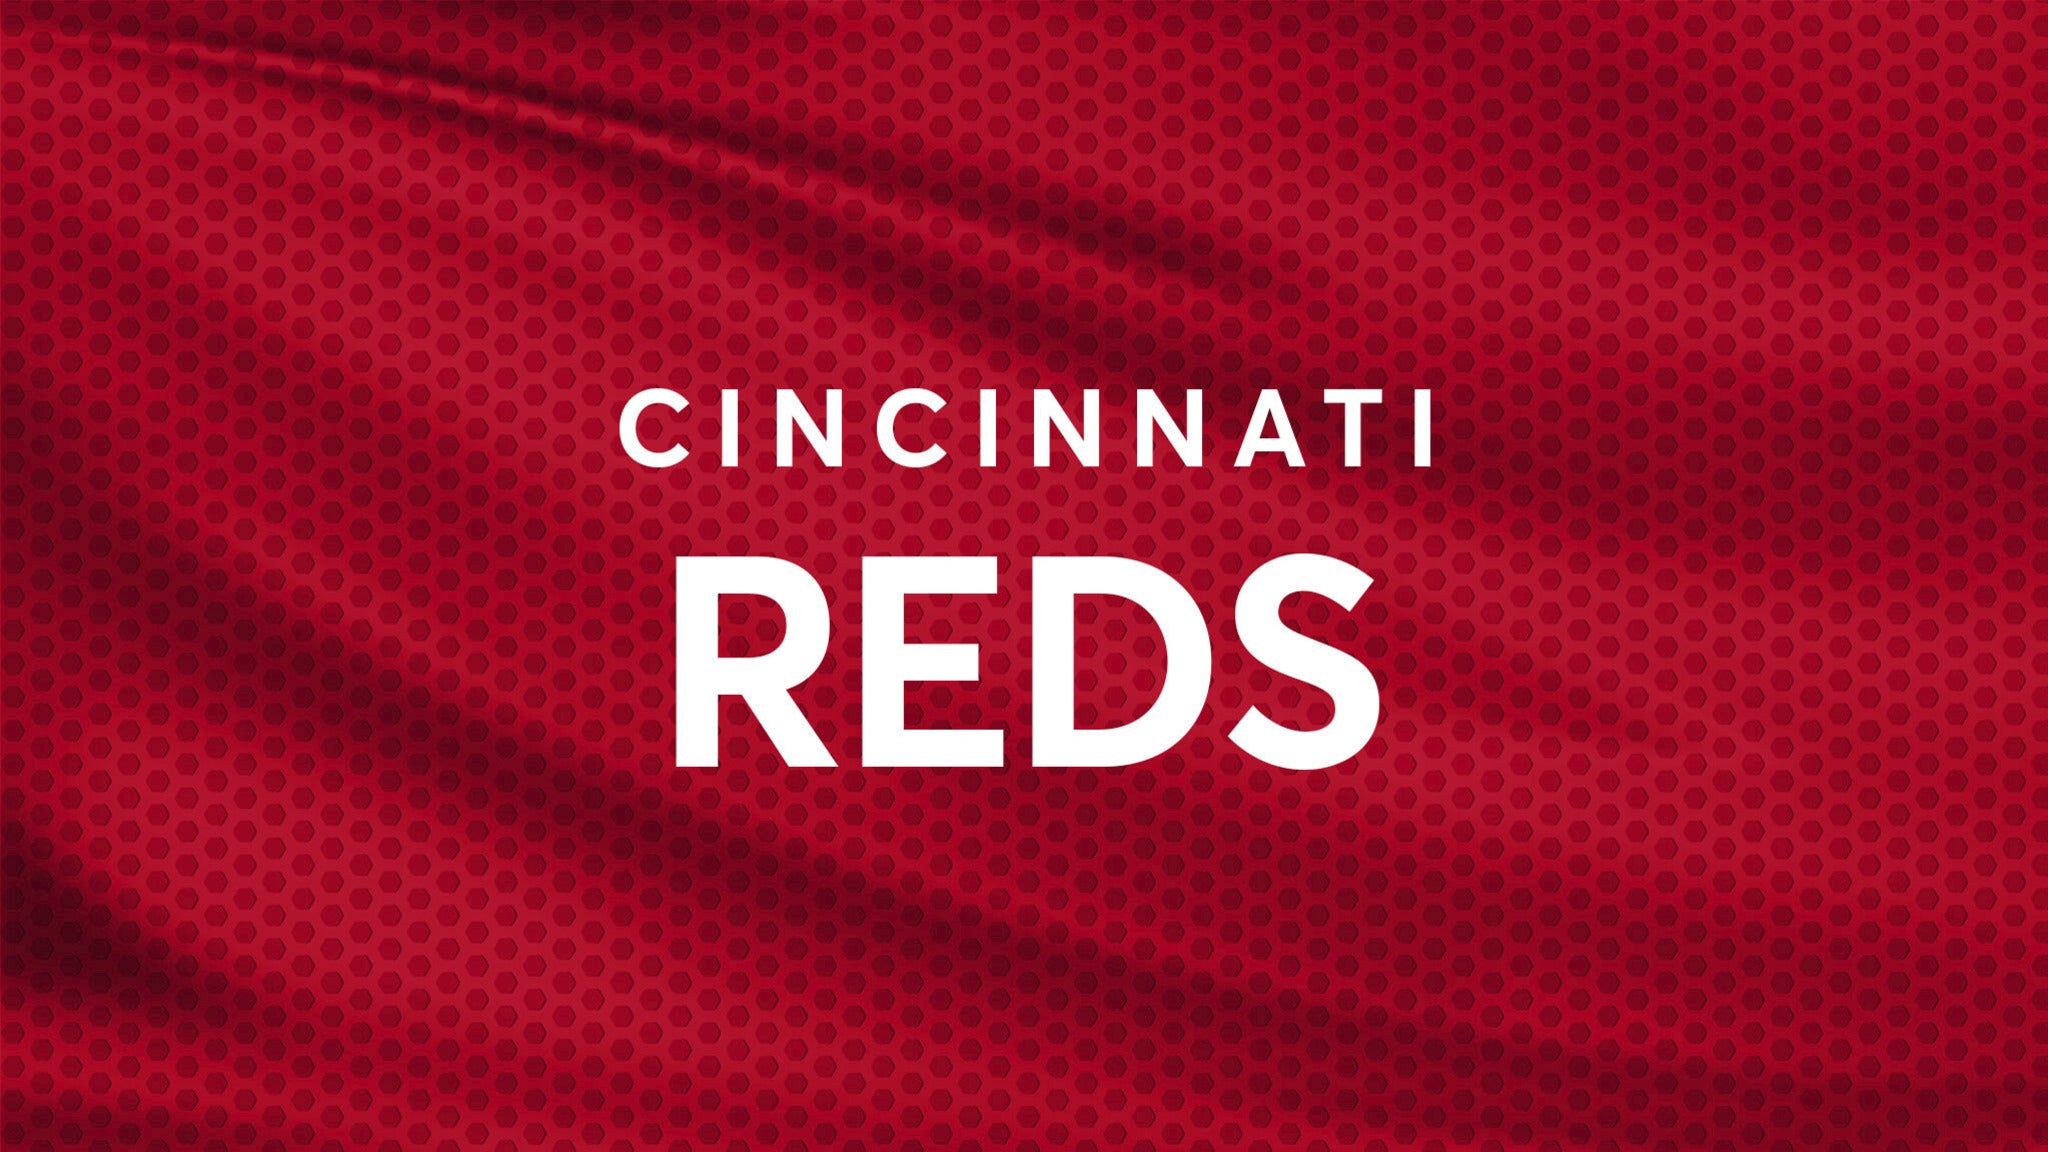 Cincinnati Reds vs. Minnesota Twins